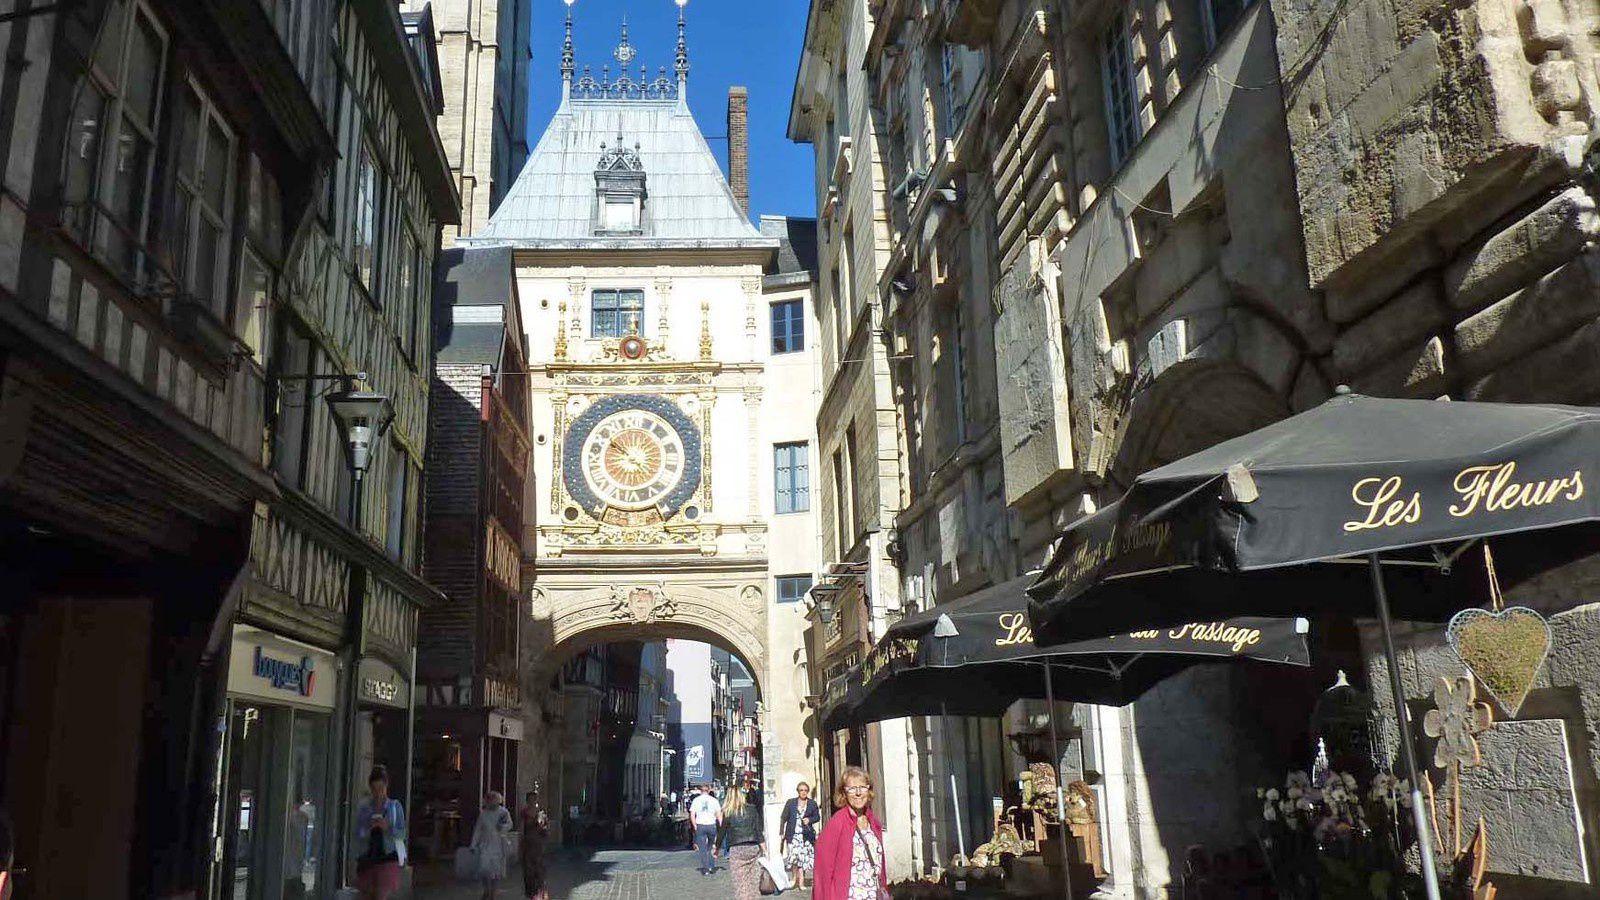 Rouen le Gros horloge.